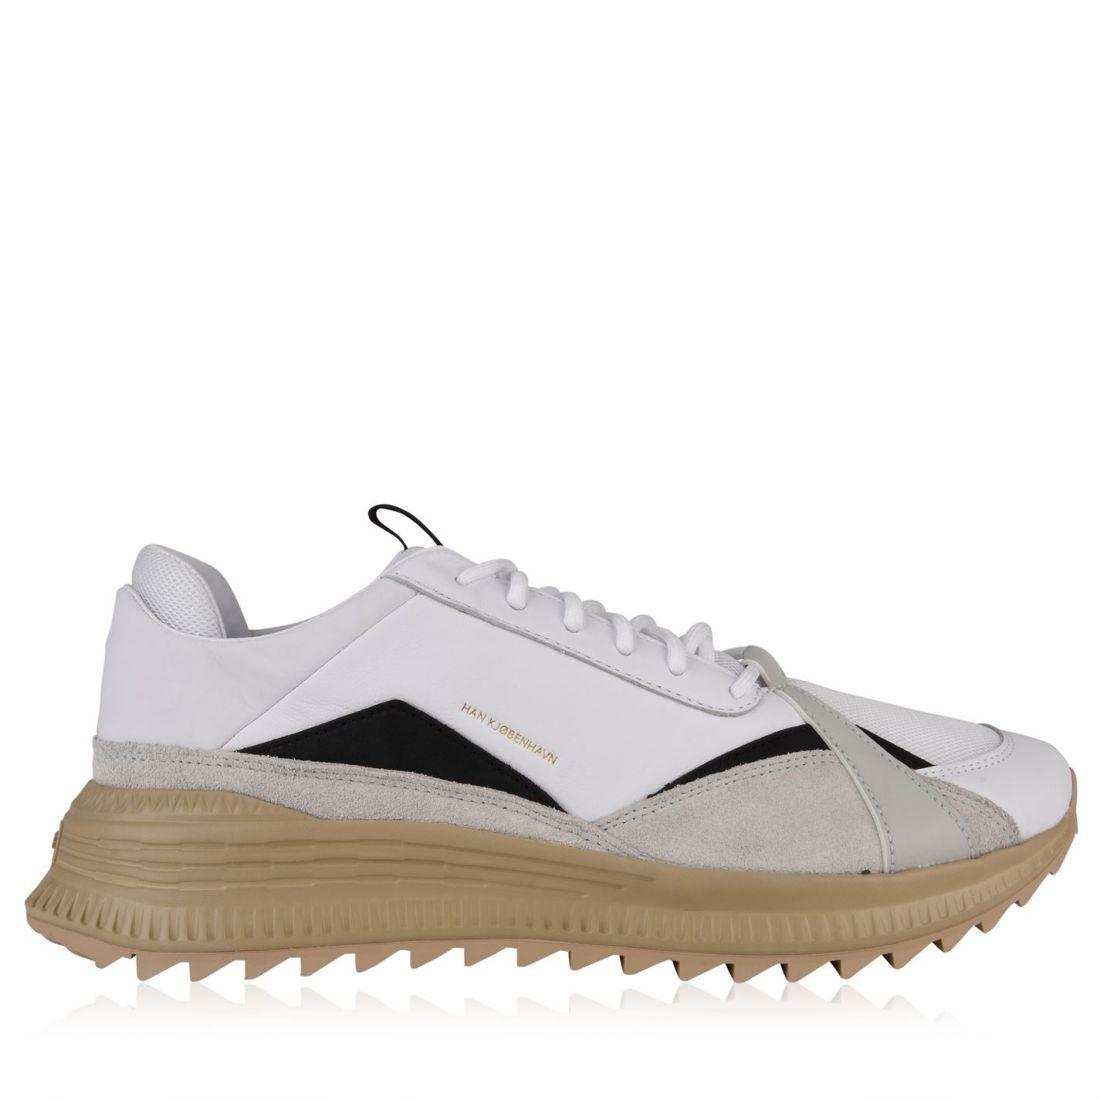 PUMA X Han Kjobenhavn Sneakers Mens Gents Runners Laces Fastened ... 439b1d40b